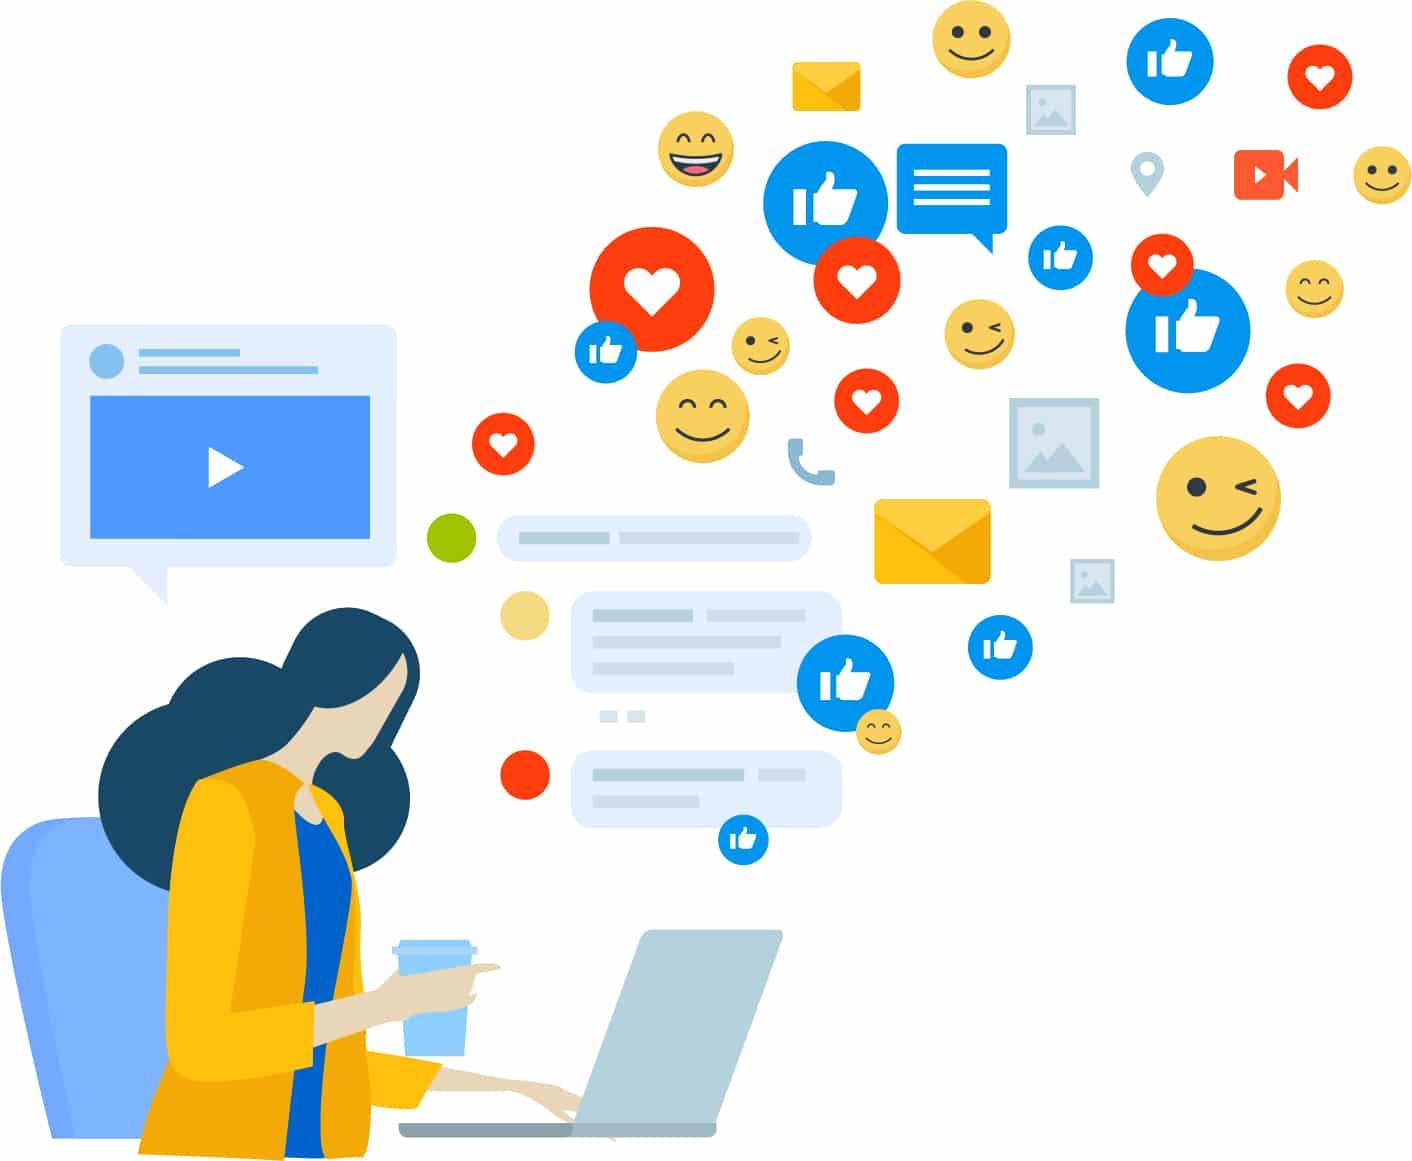 Consulenza Social Media